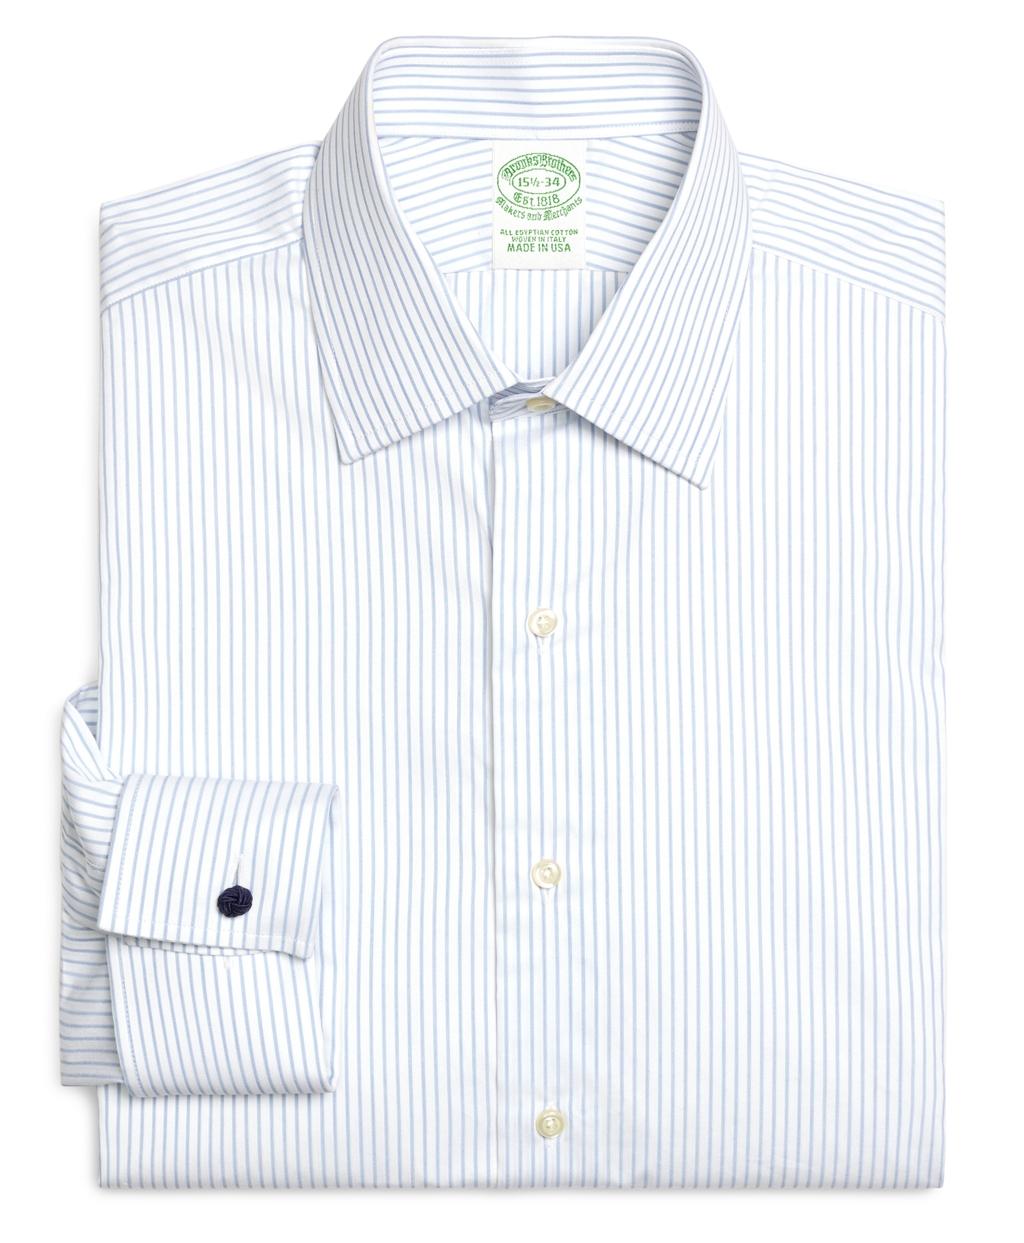 Brooks Brothers Men's Dress Shirts White